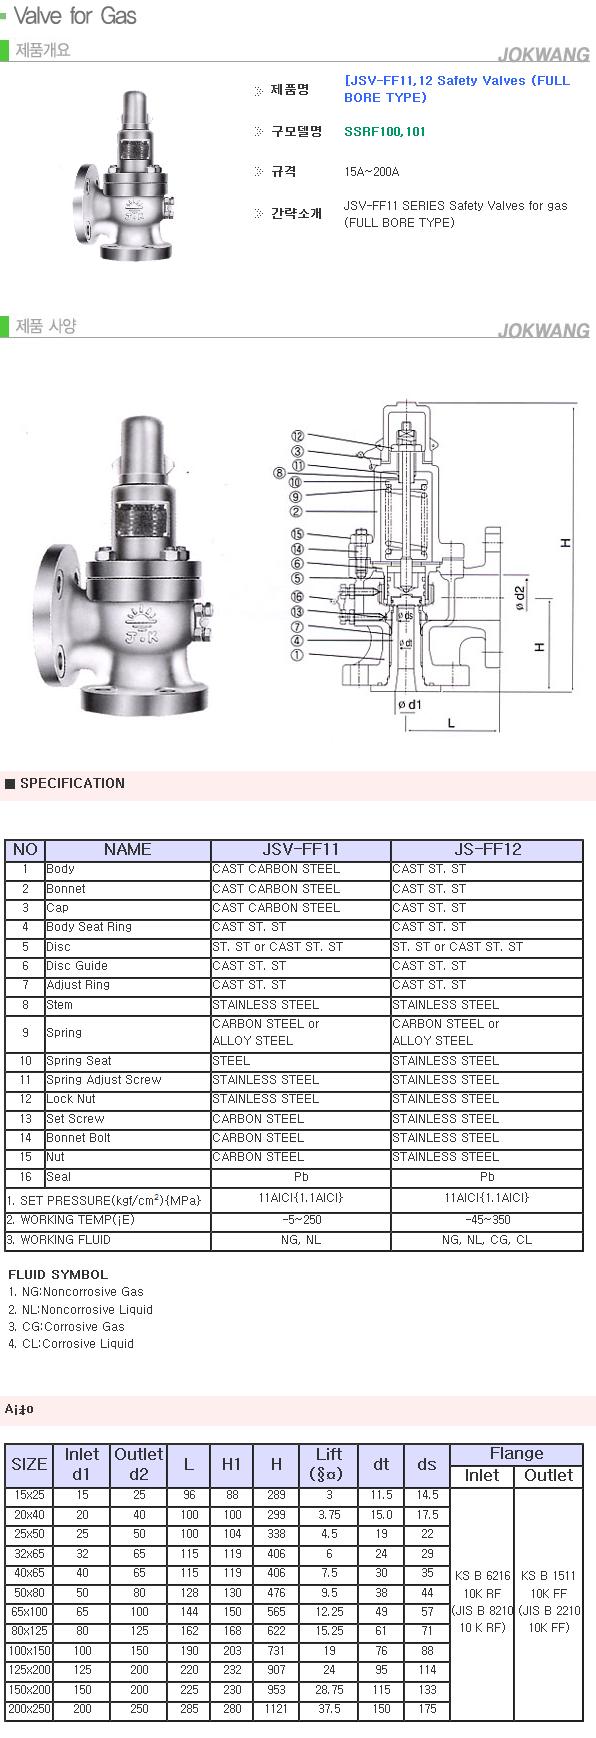 Jokwang ILI Safety Valves (Full Bore Type) JSV-FF11/12